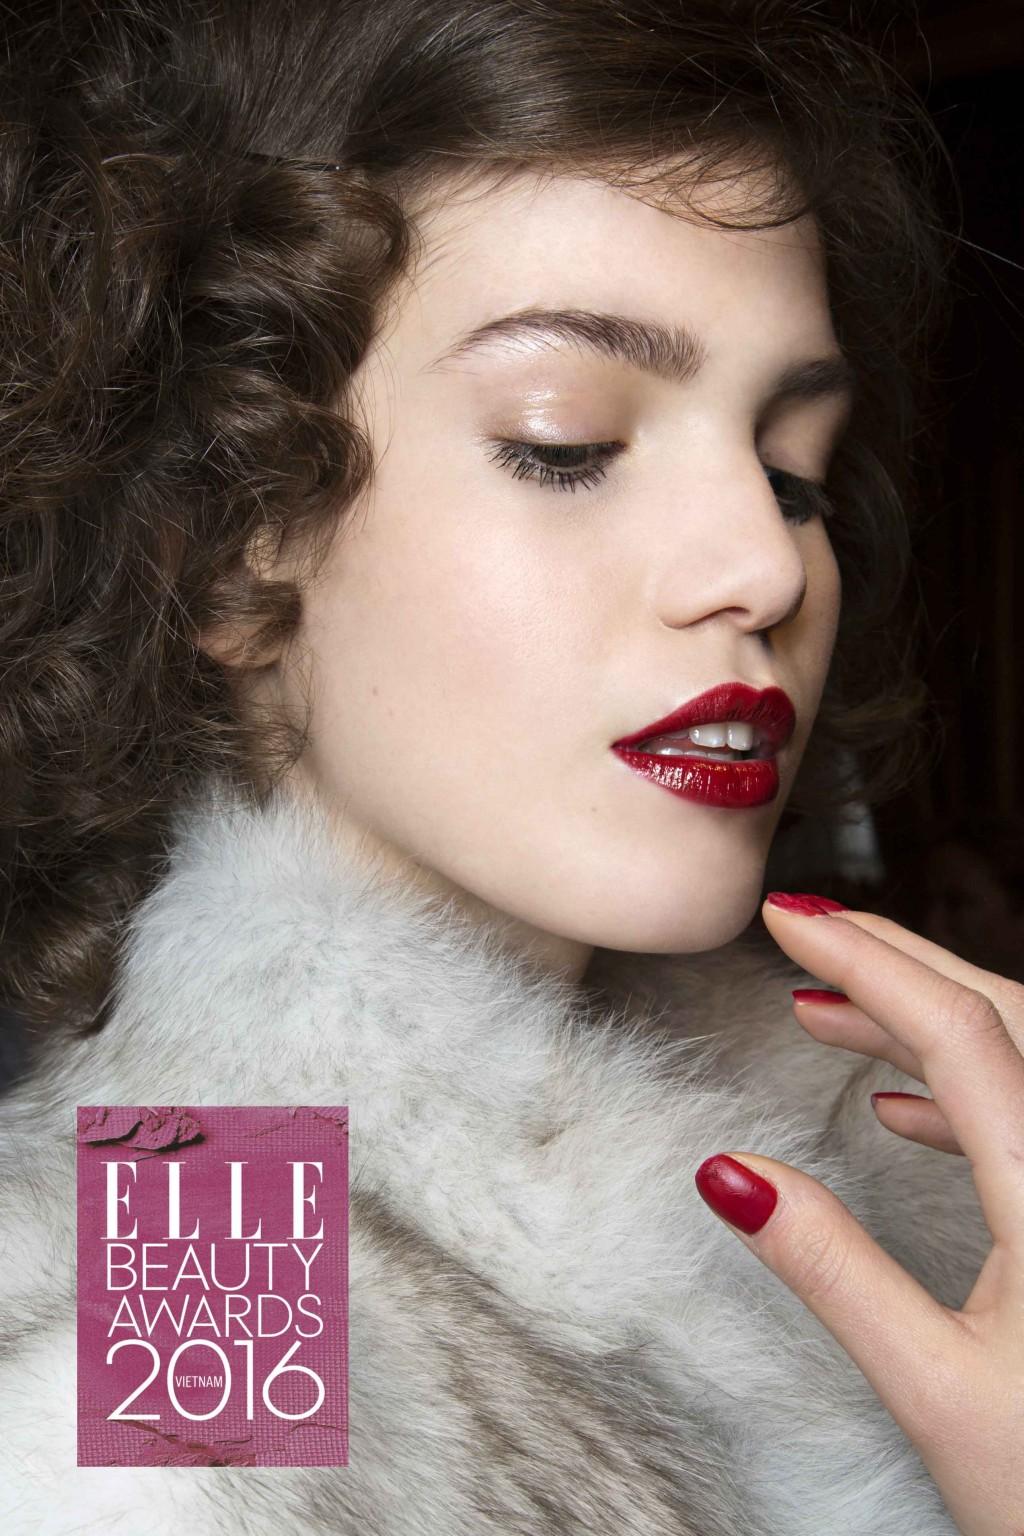 Elle beauty award 2016 - chống lão hóa - ELLE VN